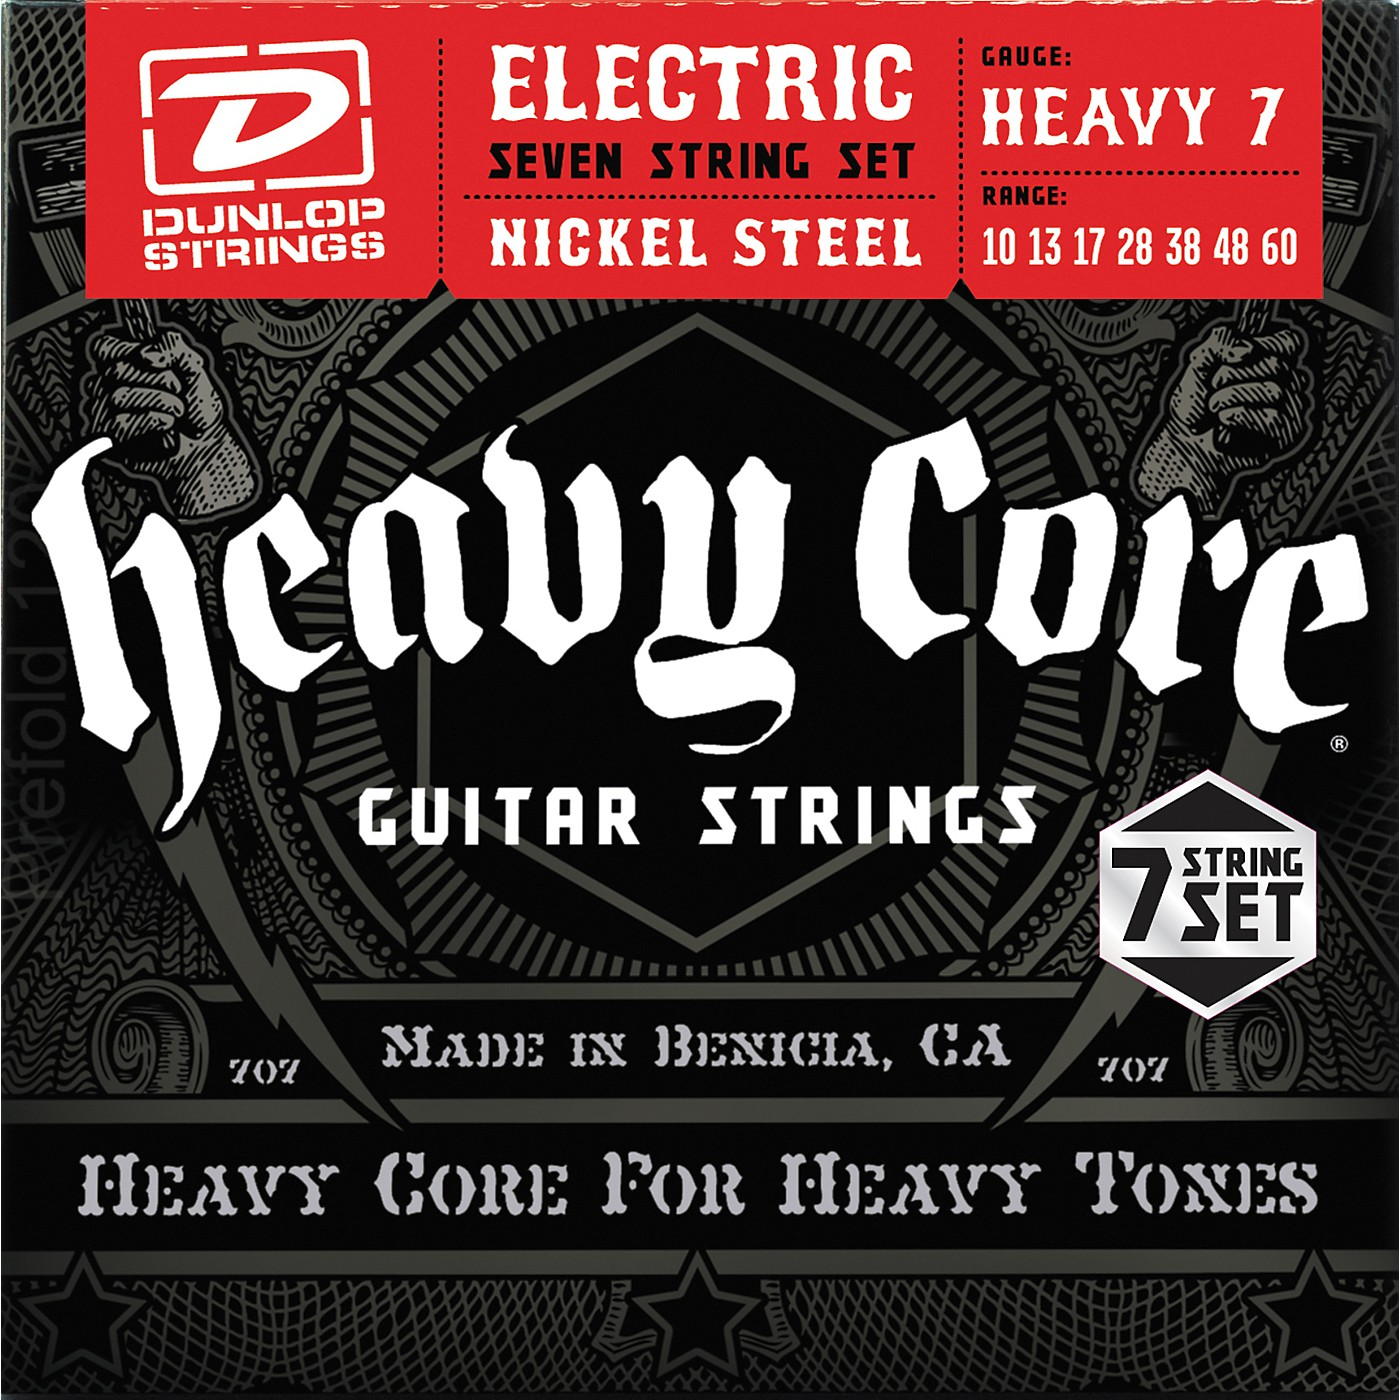 Dunlop Heavy Core 7-String Electric Guitar Strings - Heavy Gauge thumbnail